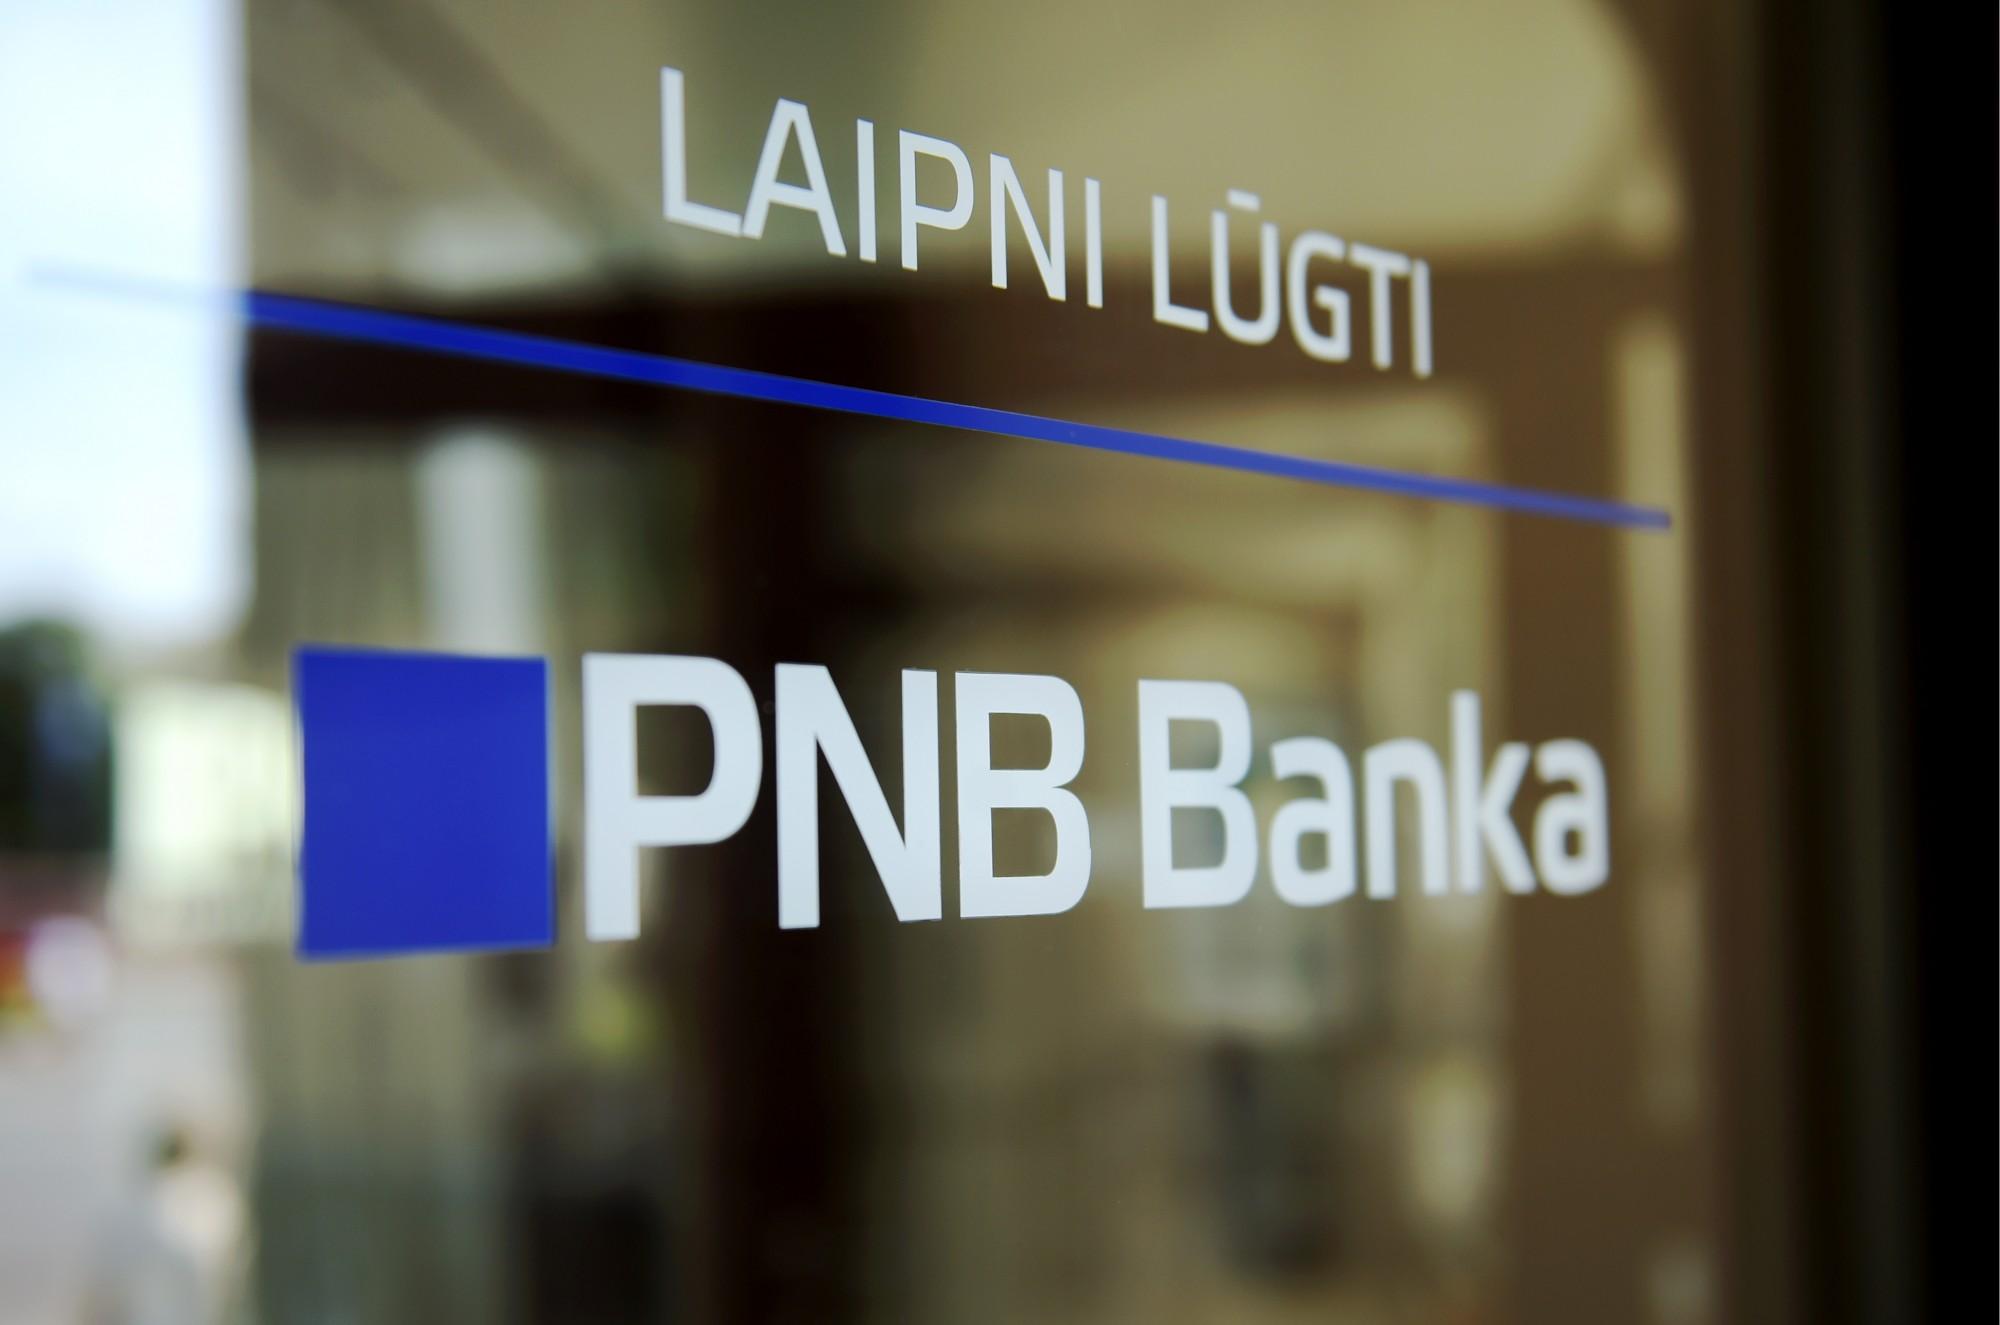 Суд объявил «PNB bankа» неплатежеспособным